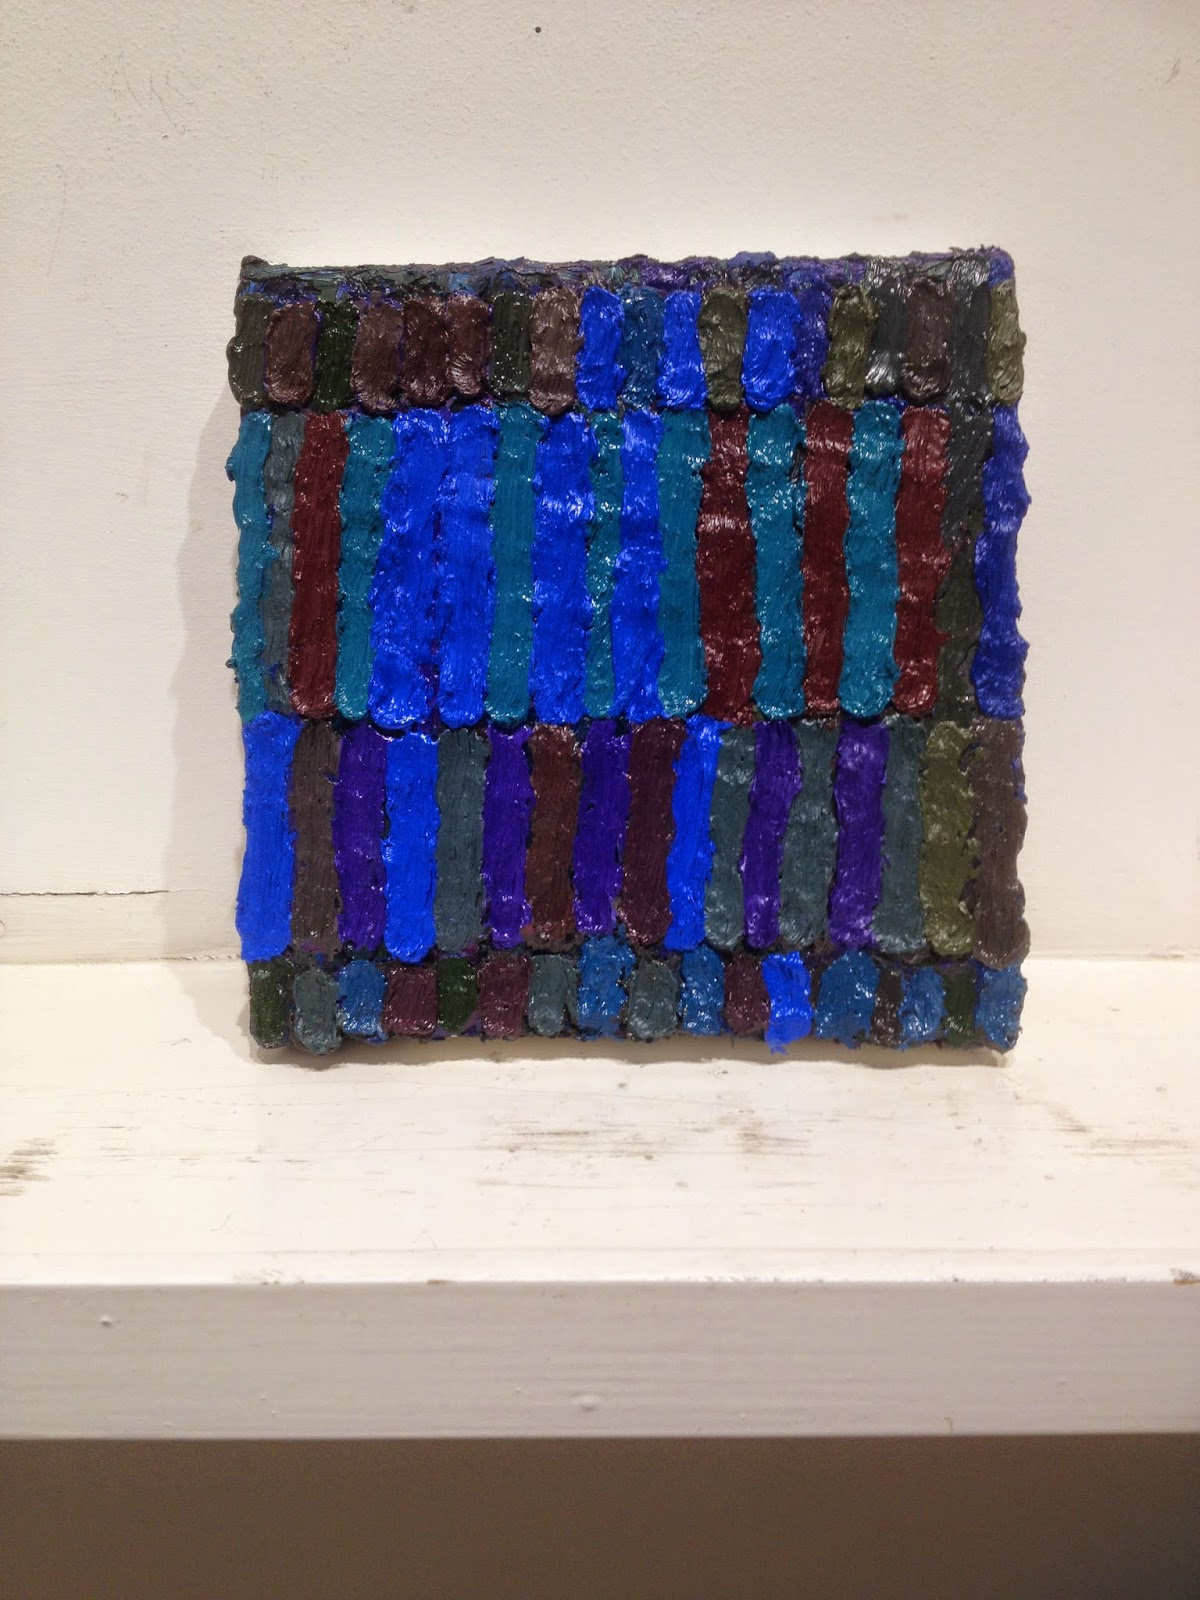 Brett Baker, Moon, Then Studio, 2014-2015, oil on canvas, 6 x 6 inches (photo: S